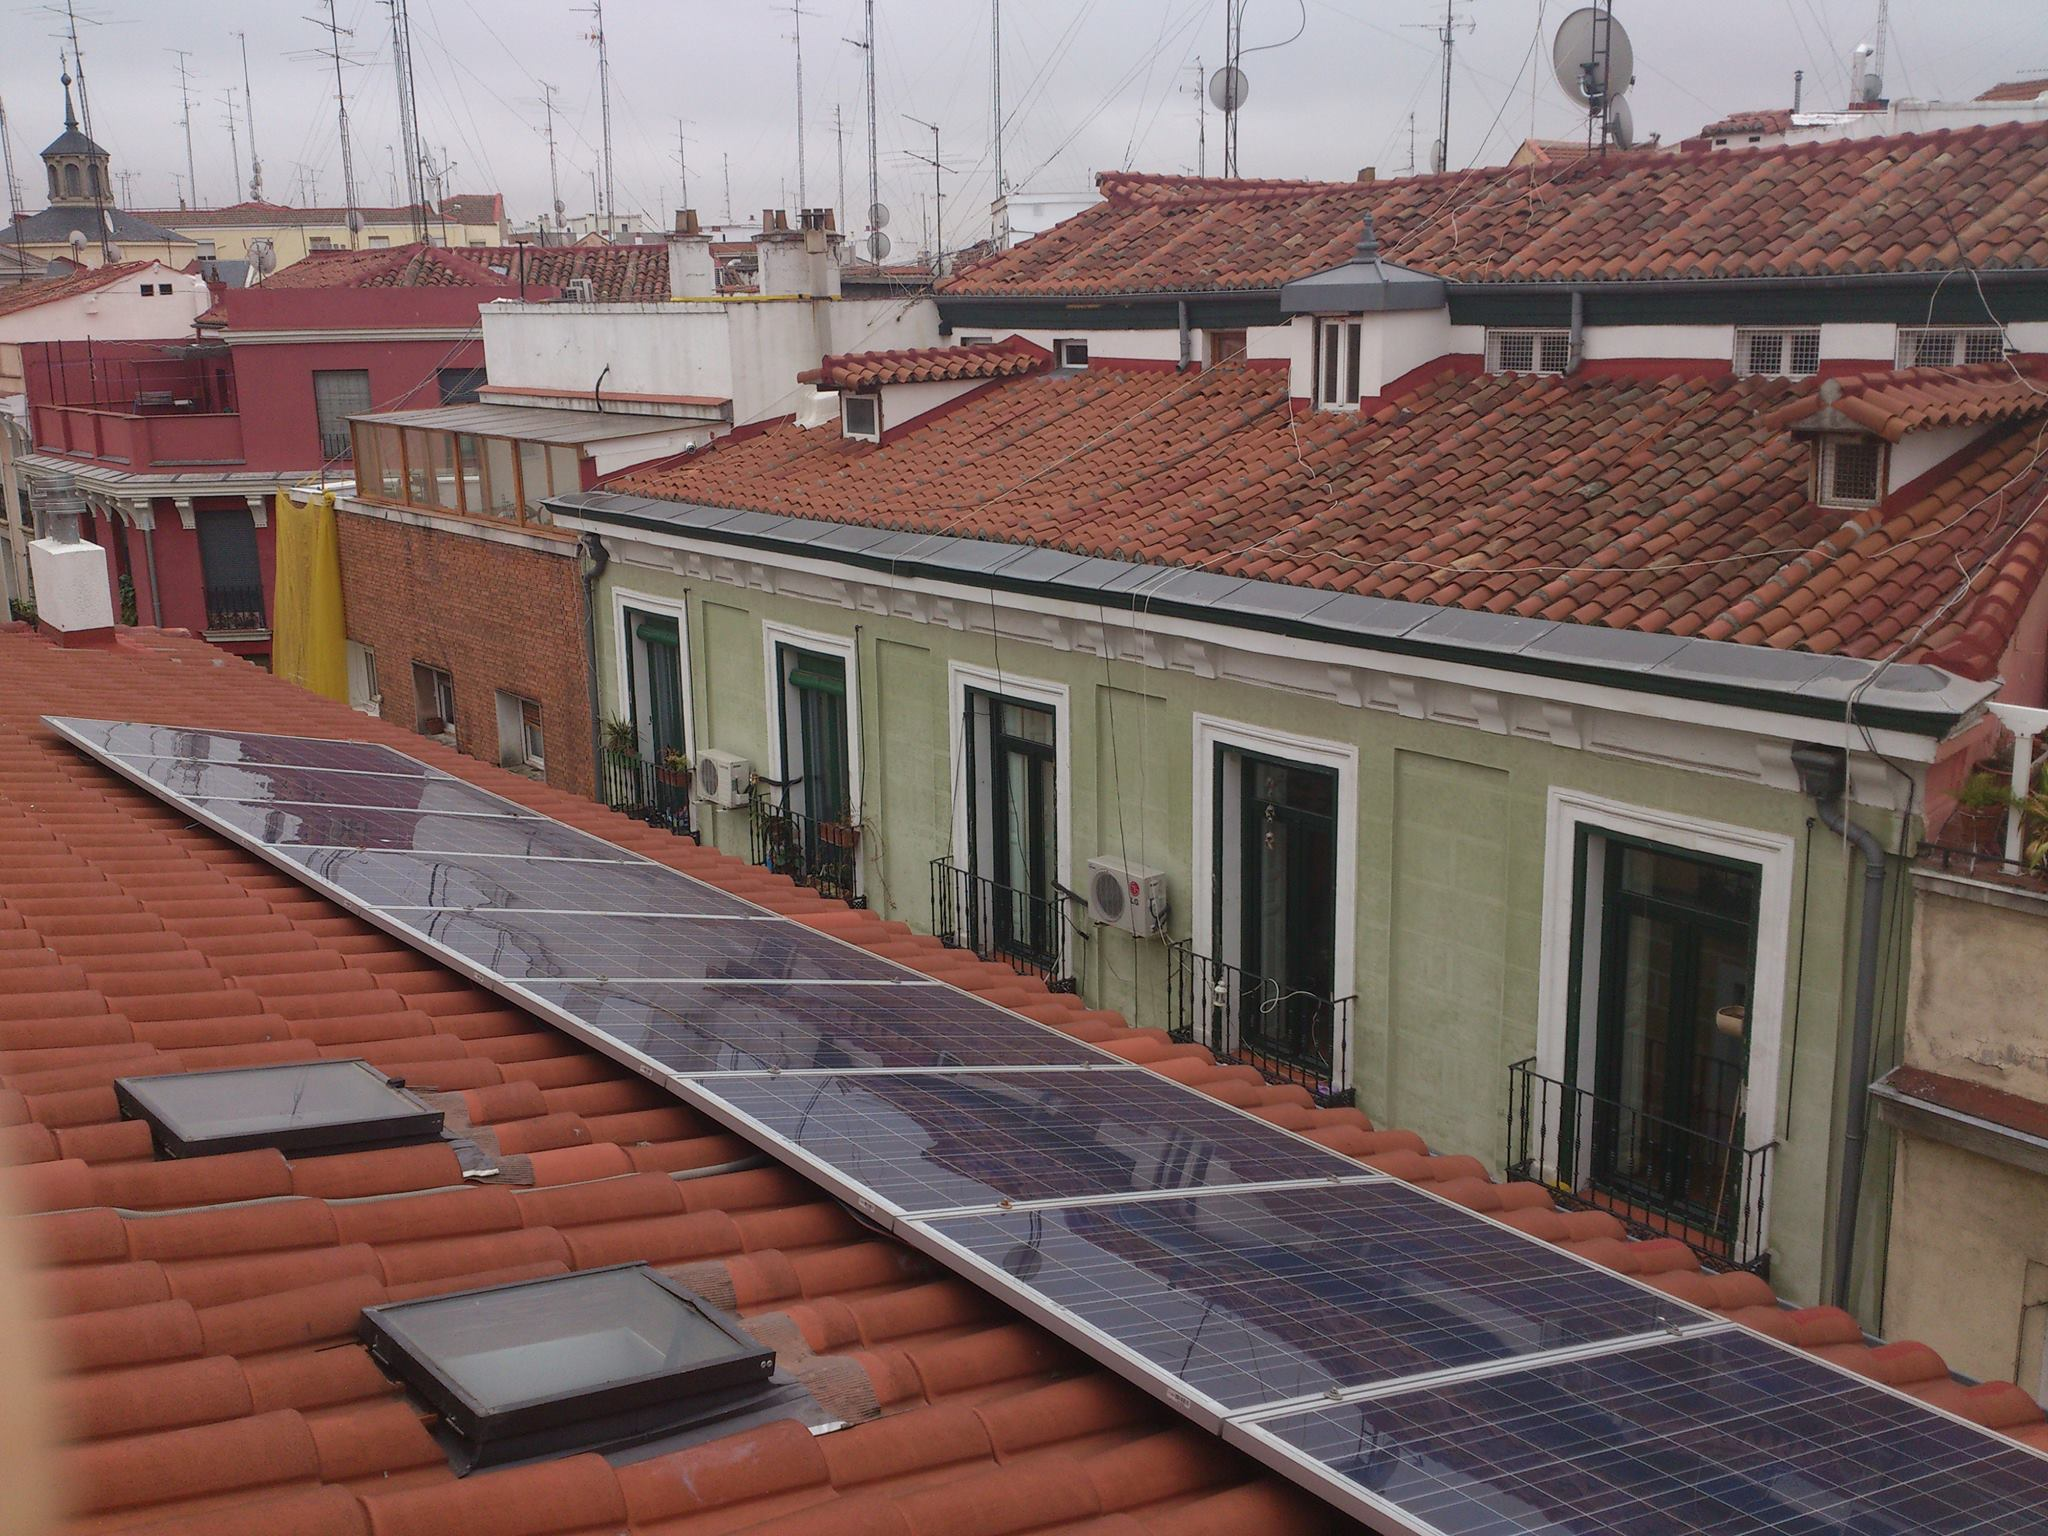 Lavapi s solar energ a limpia para todo un barrio alterconsumismo blogs el pa s - Energia solar madrid ...